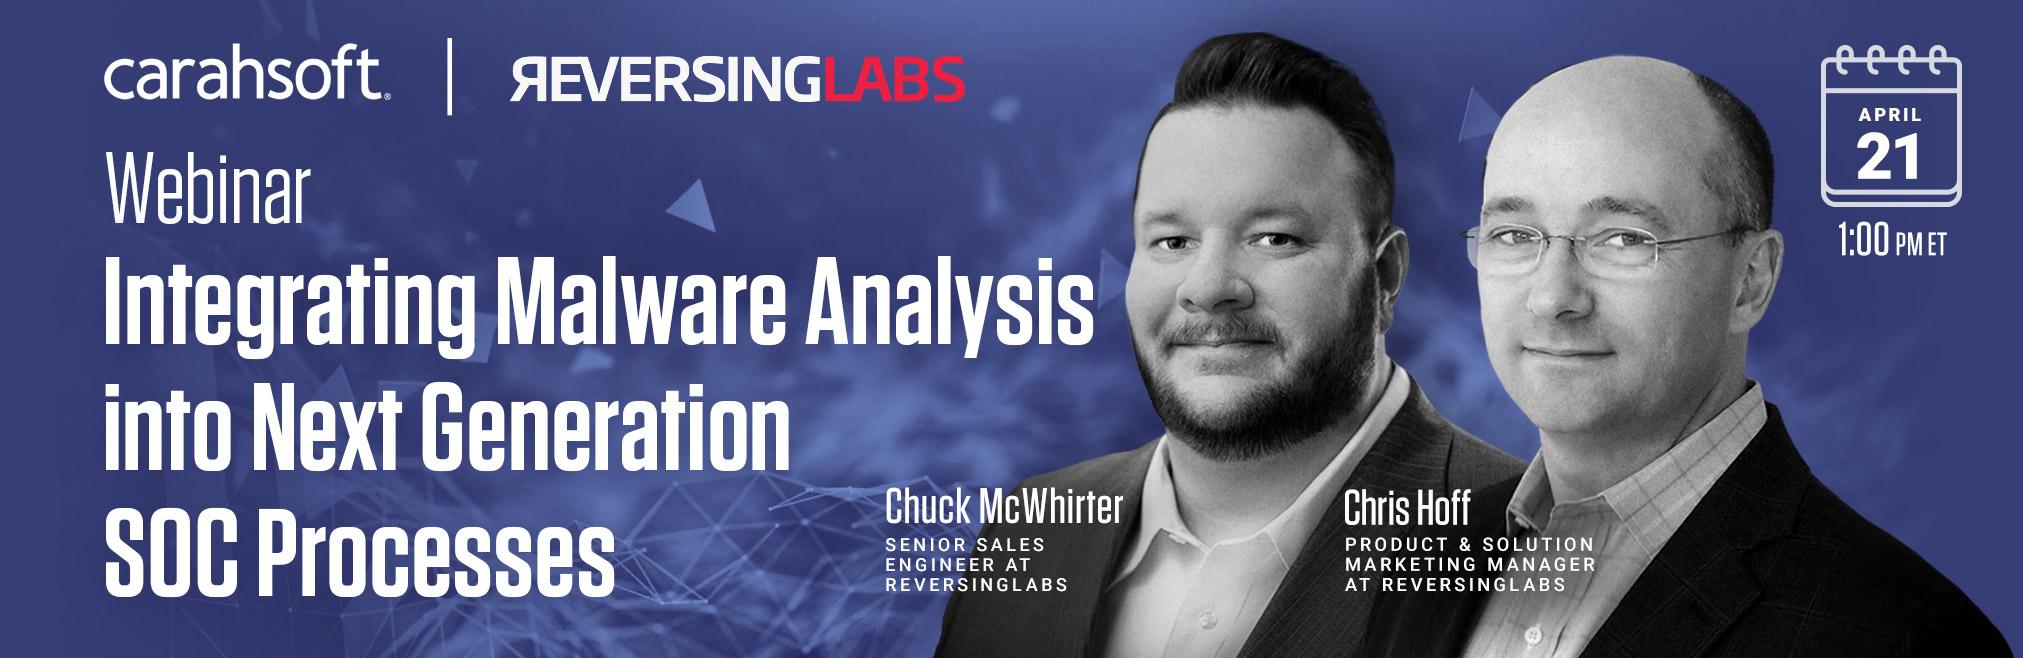 Integrating Malware Analysis intoNext Generation SOC Processes